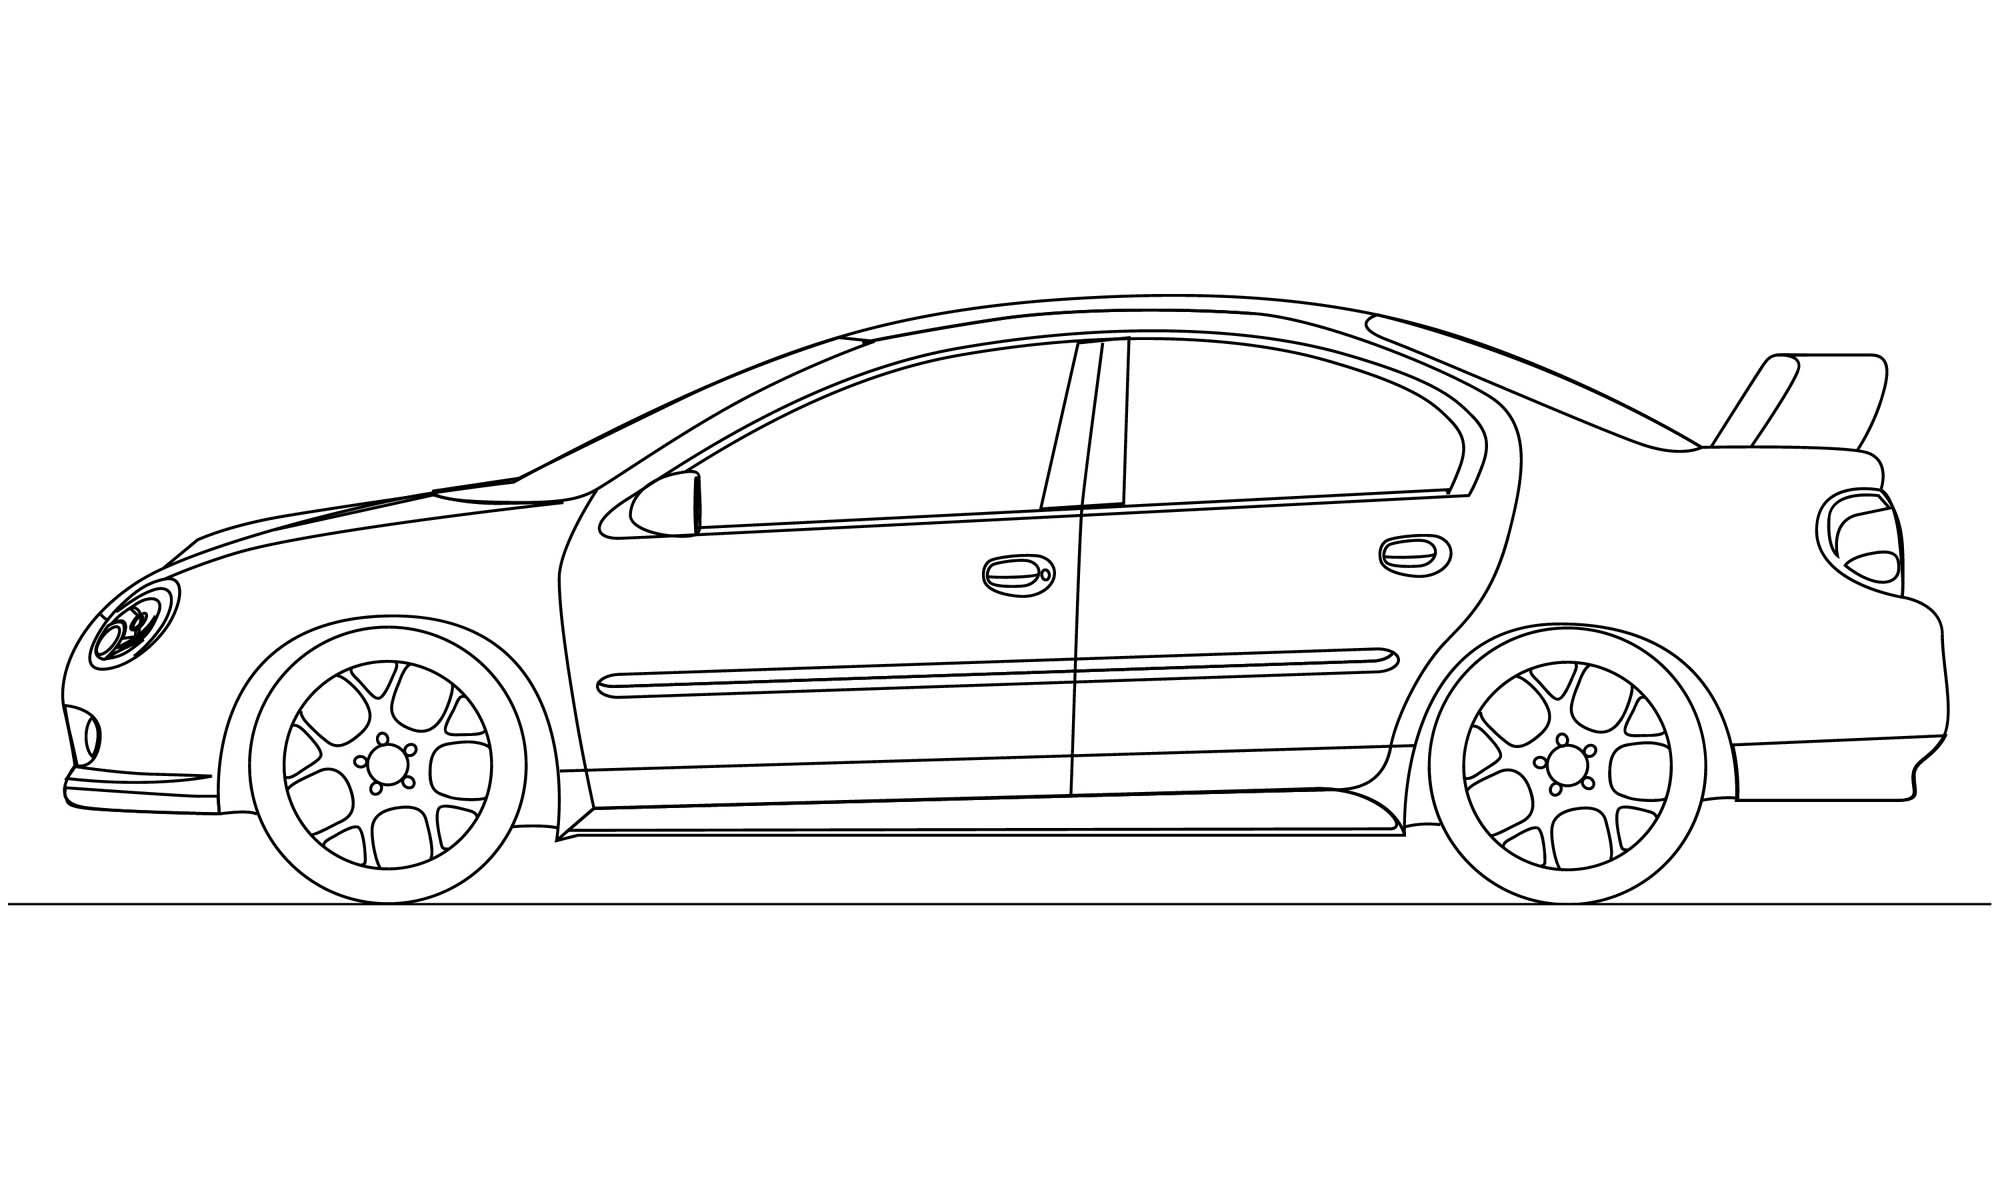 Srt 4 Line Drawing